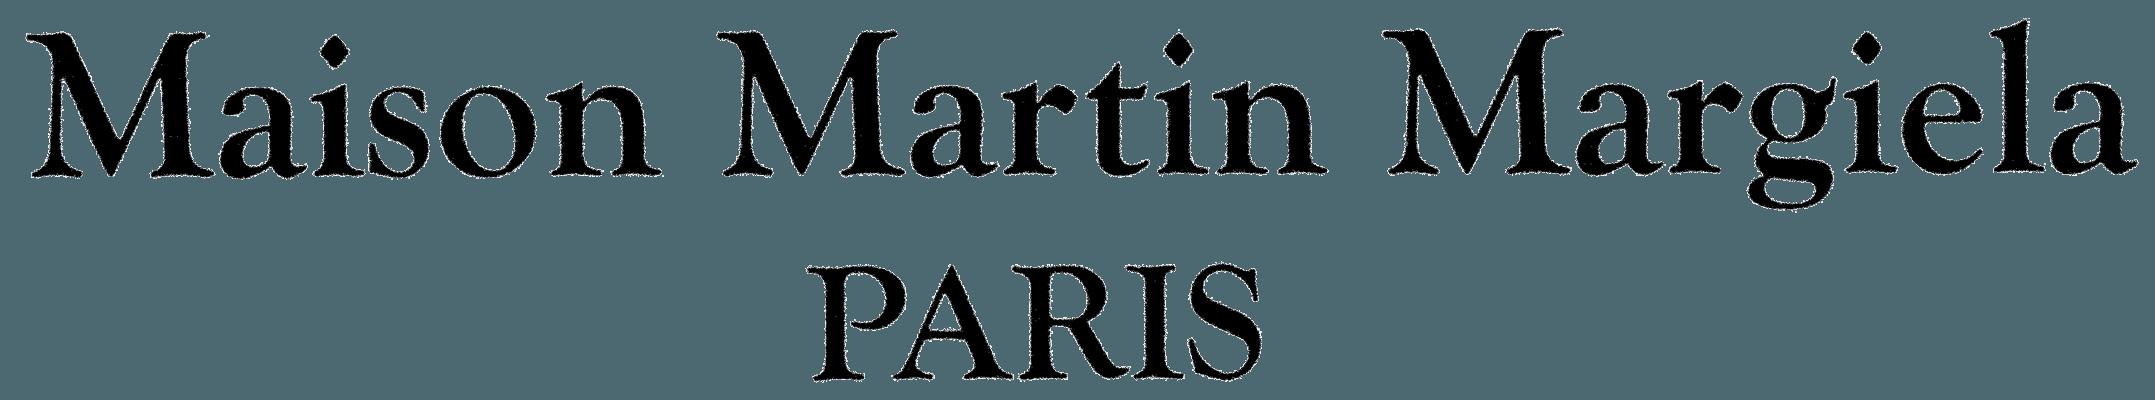 new product 7d13b 7898e Maison Martin Margiela Logo - LogoDix